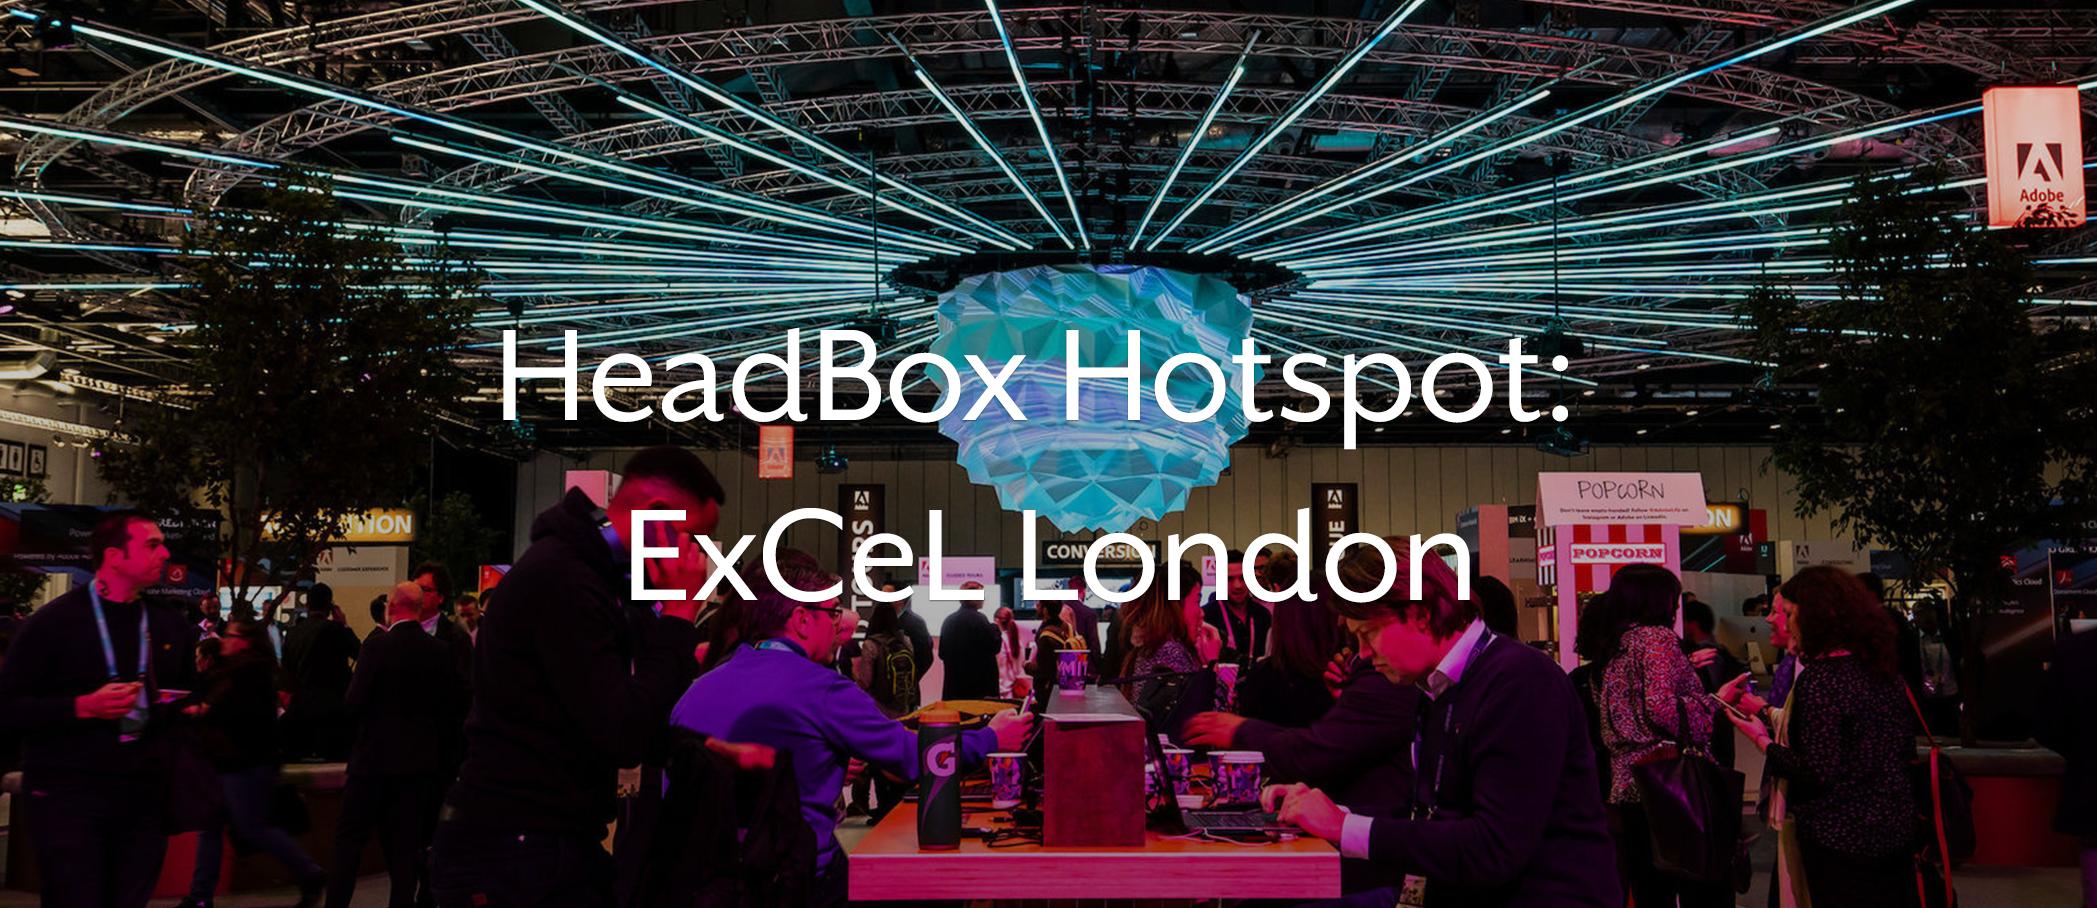 headbox hotspot excel london